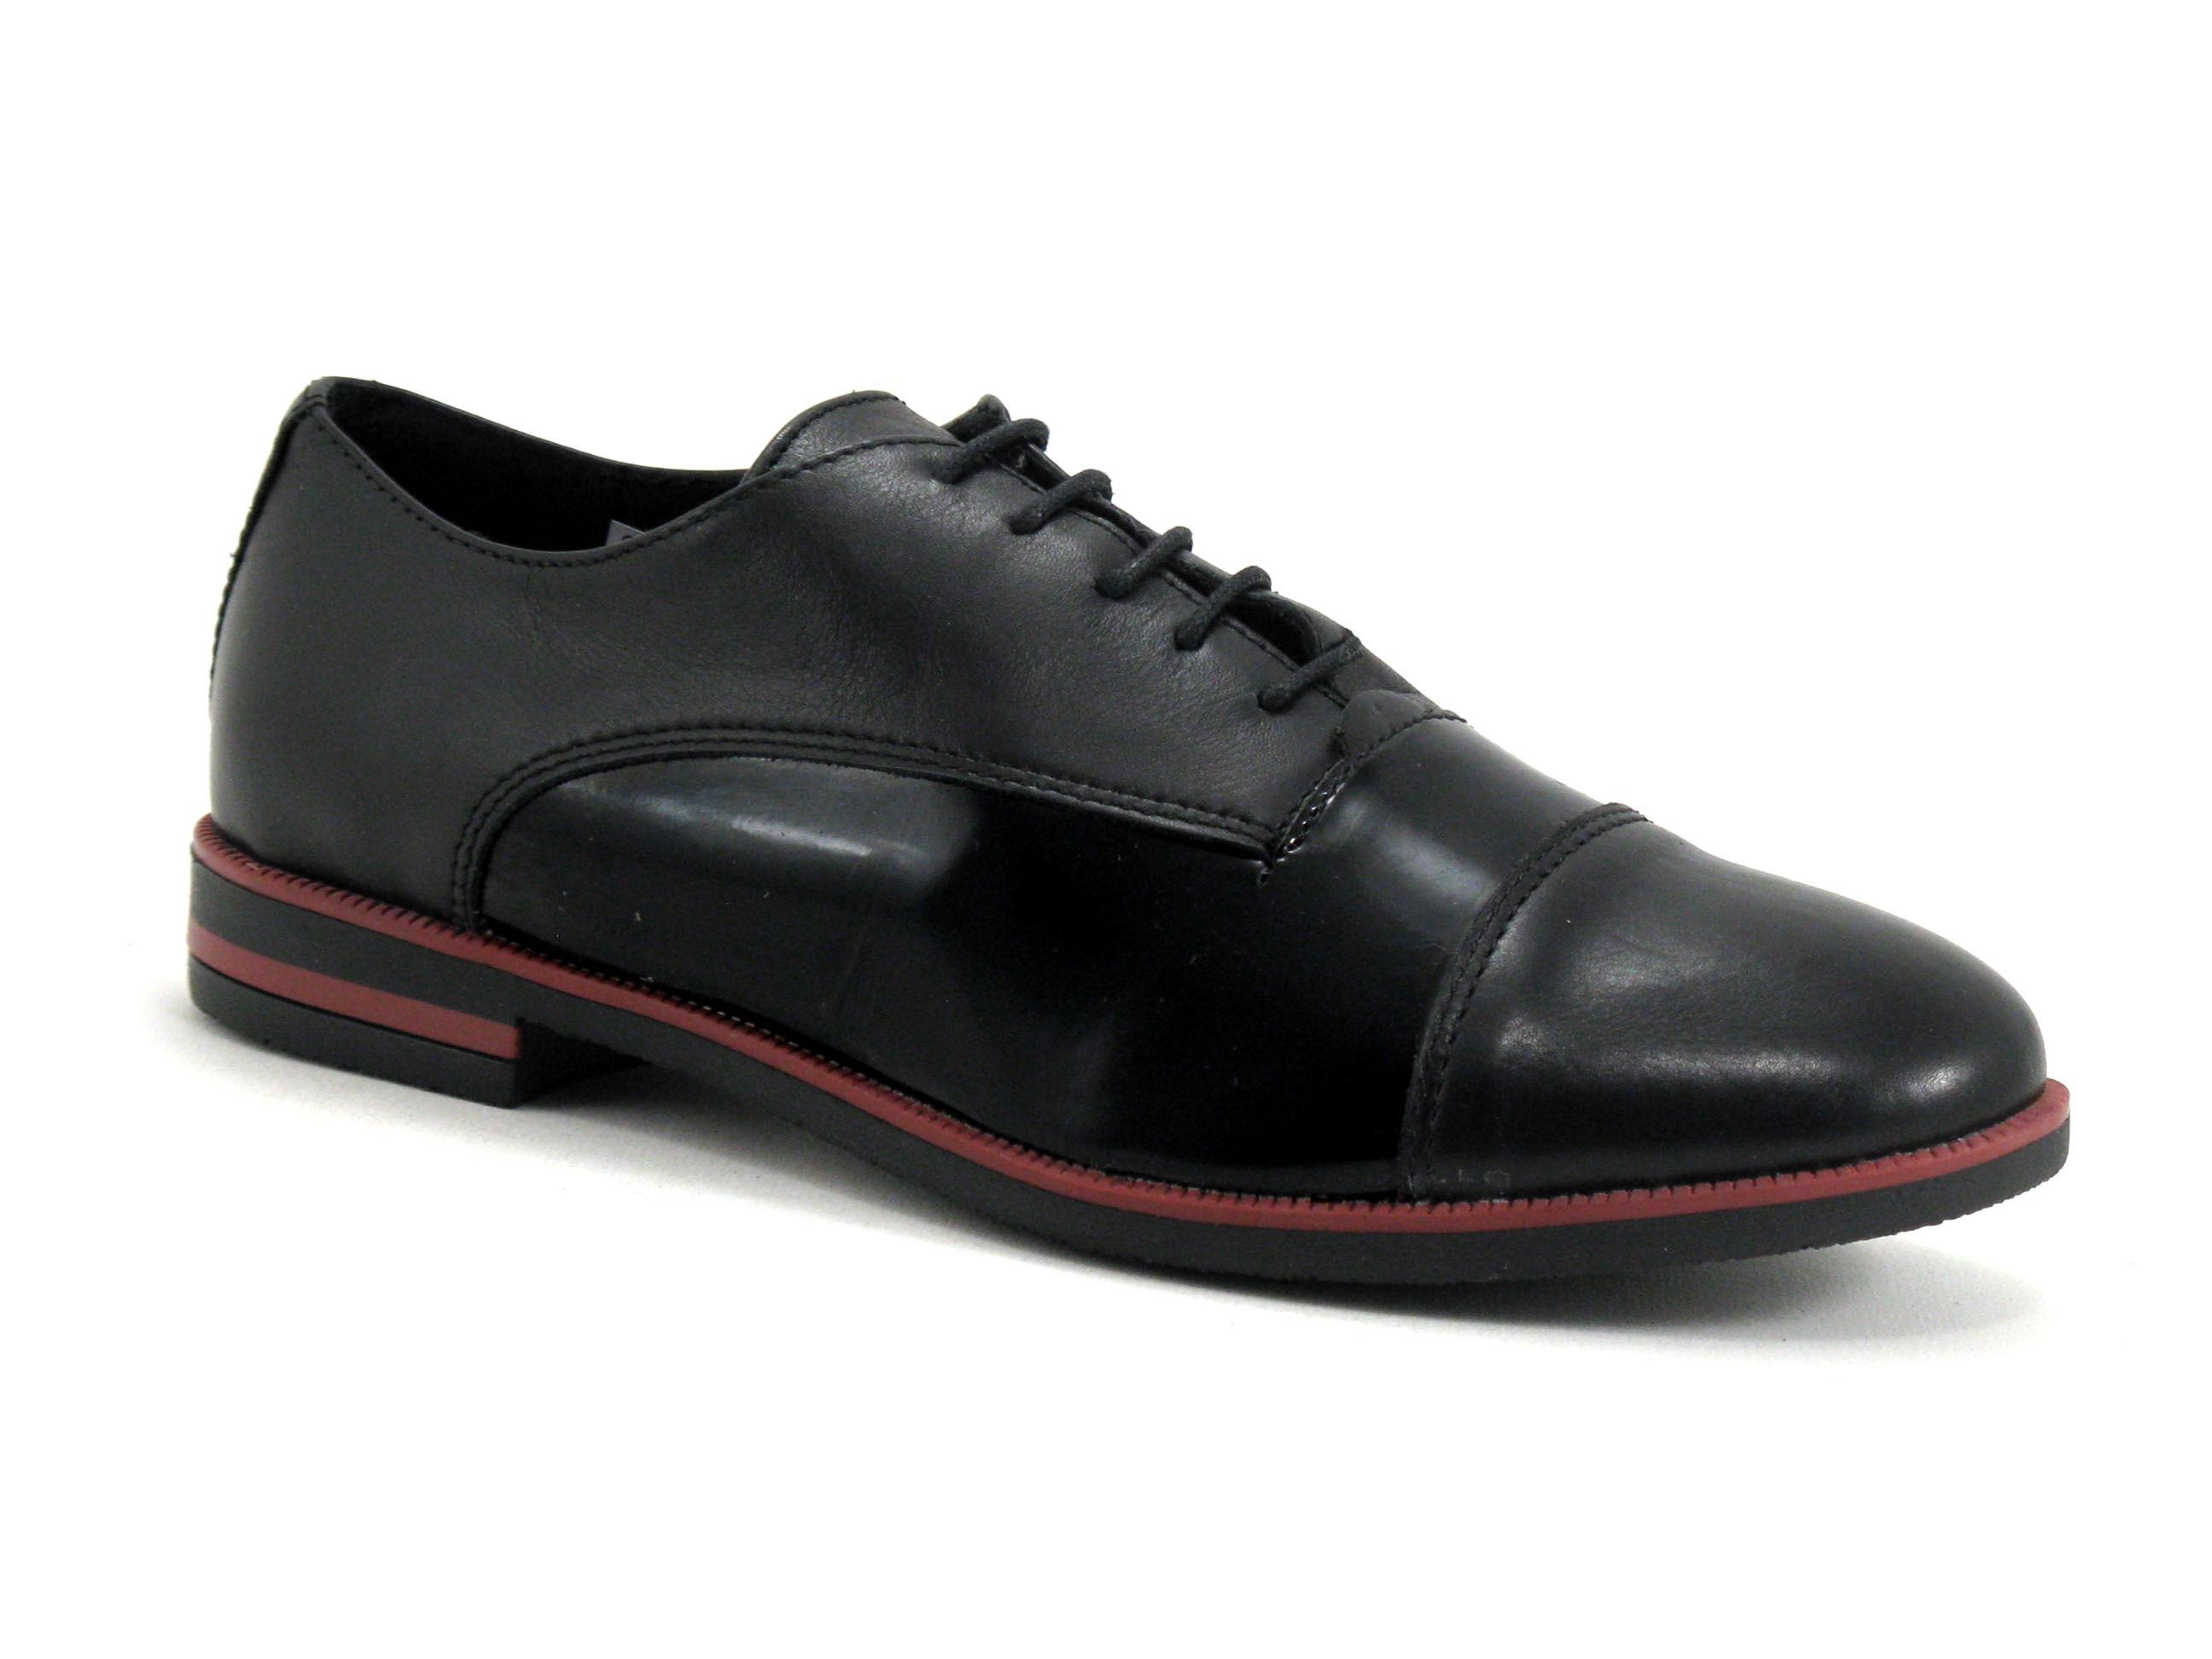 Moran's Chaussure basse / Derby Femme Moran's - Noir - Point. 36,37,38,39,40,41